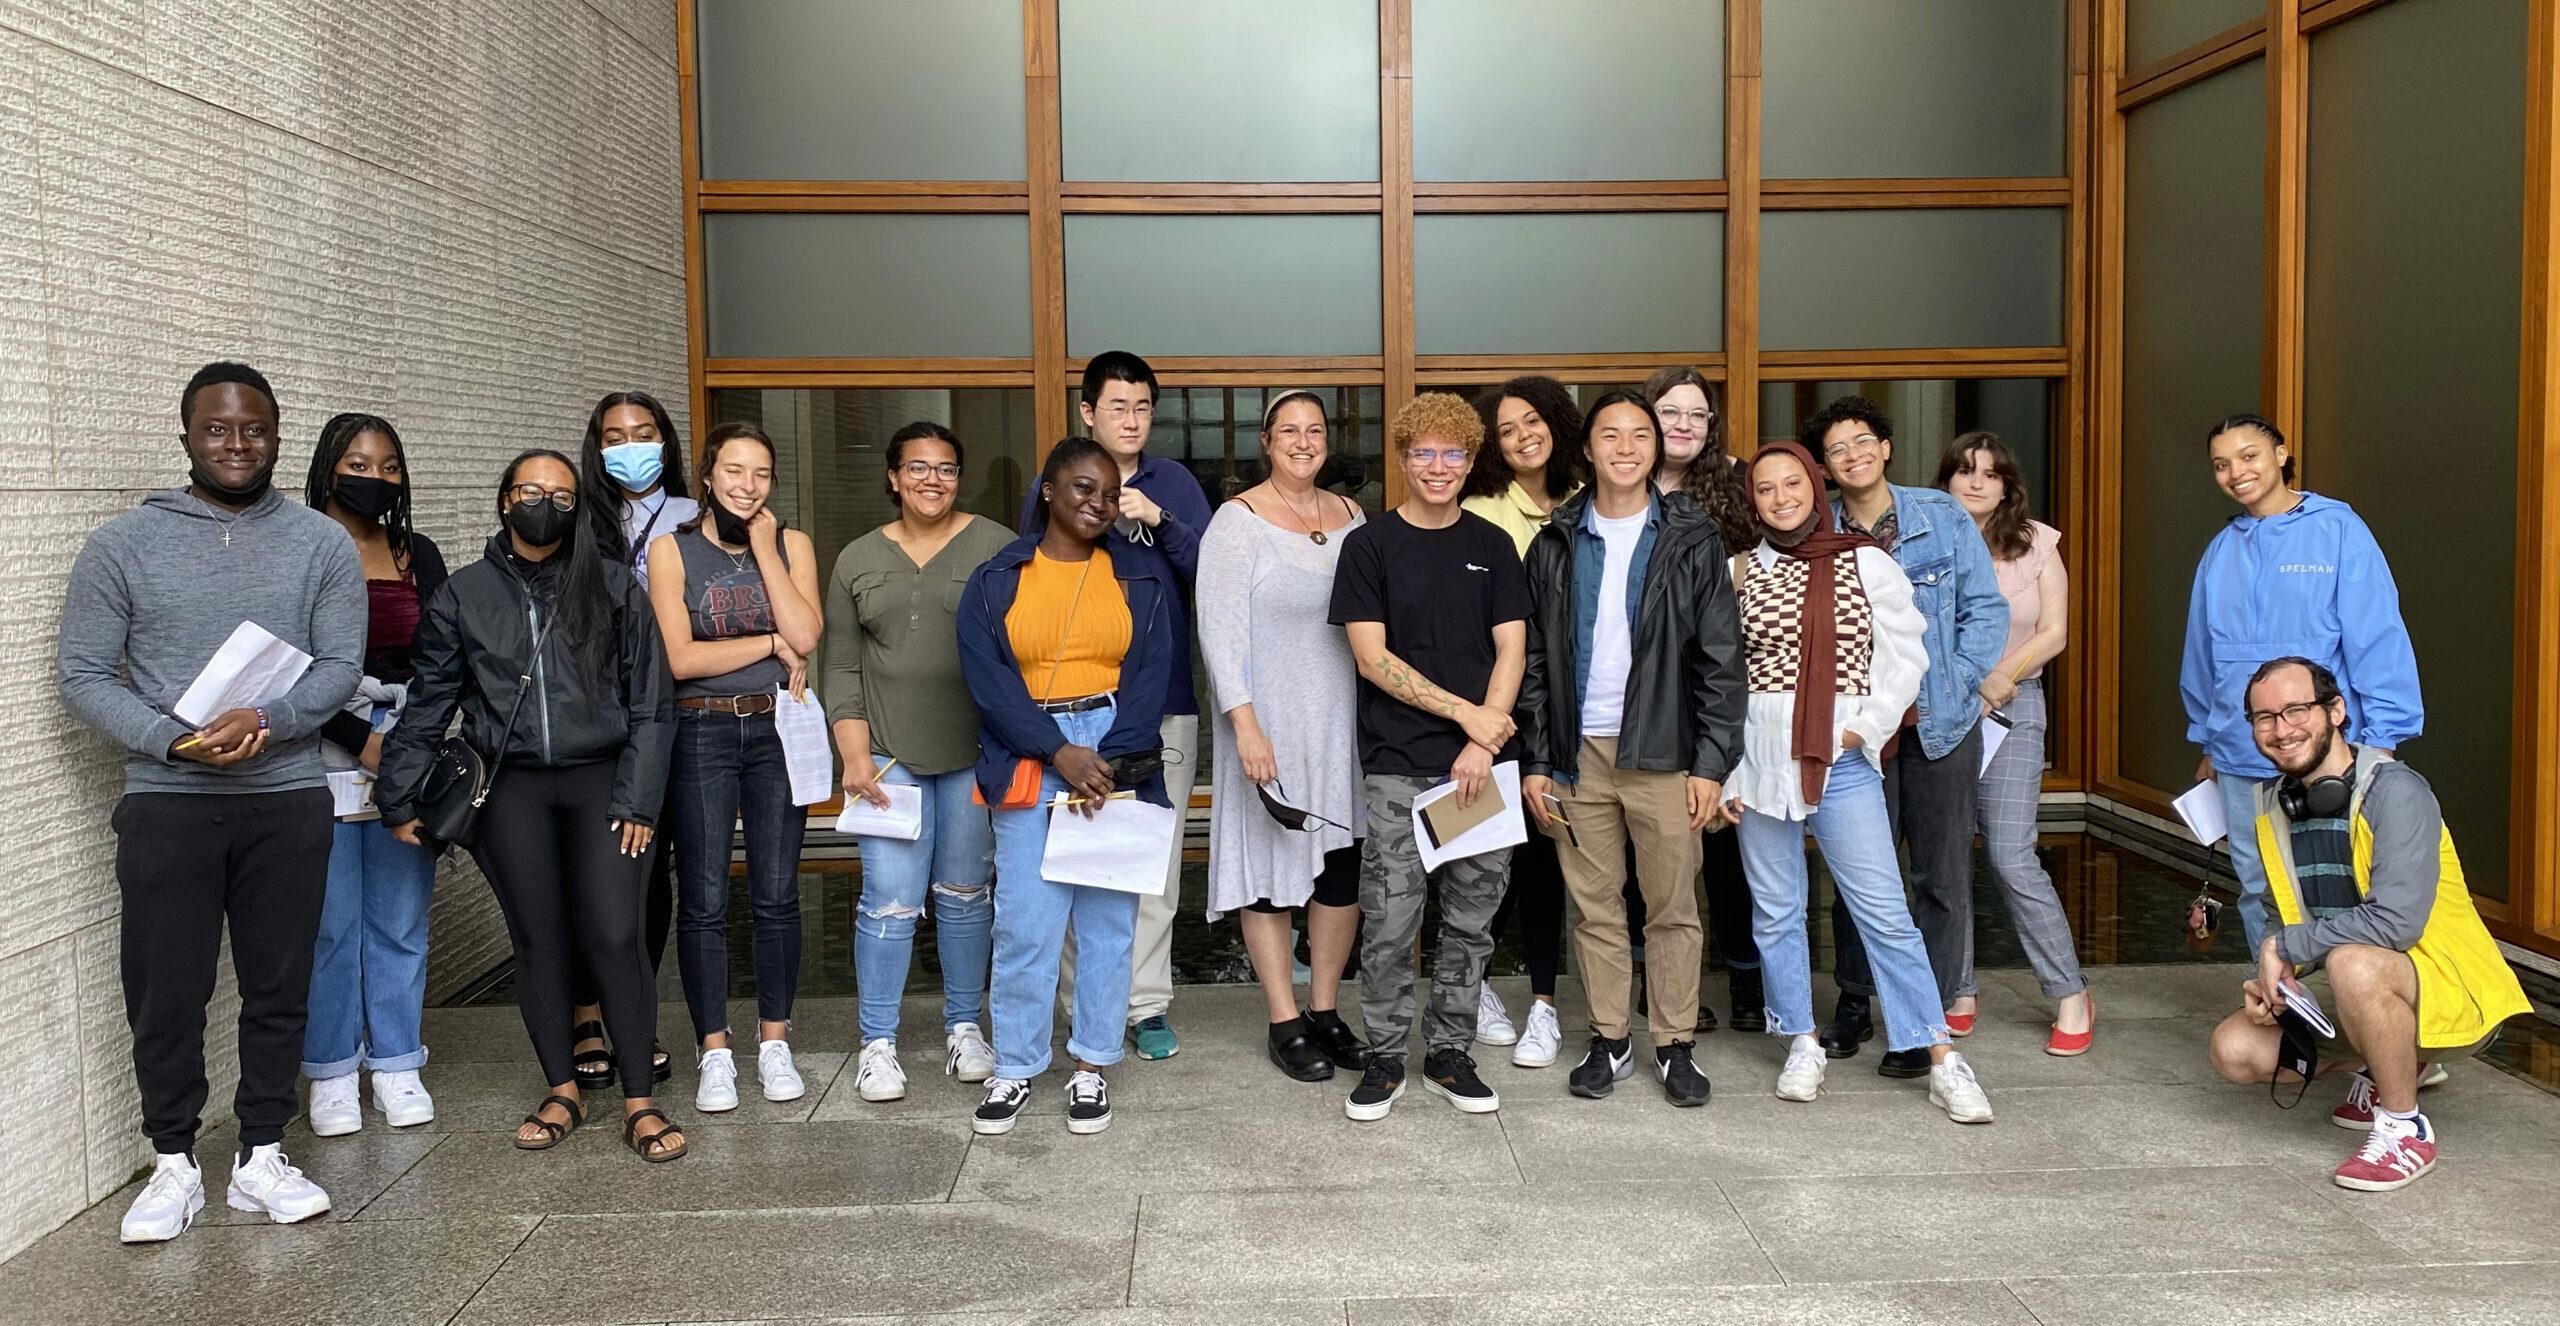 Group Photo of Students from the Summer Undergraduate Internship Program